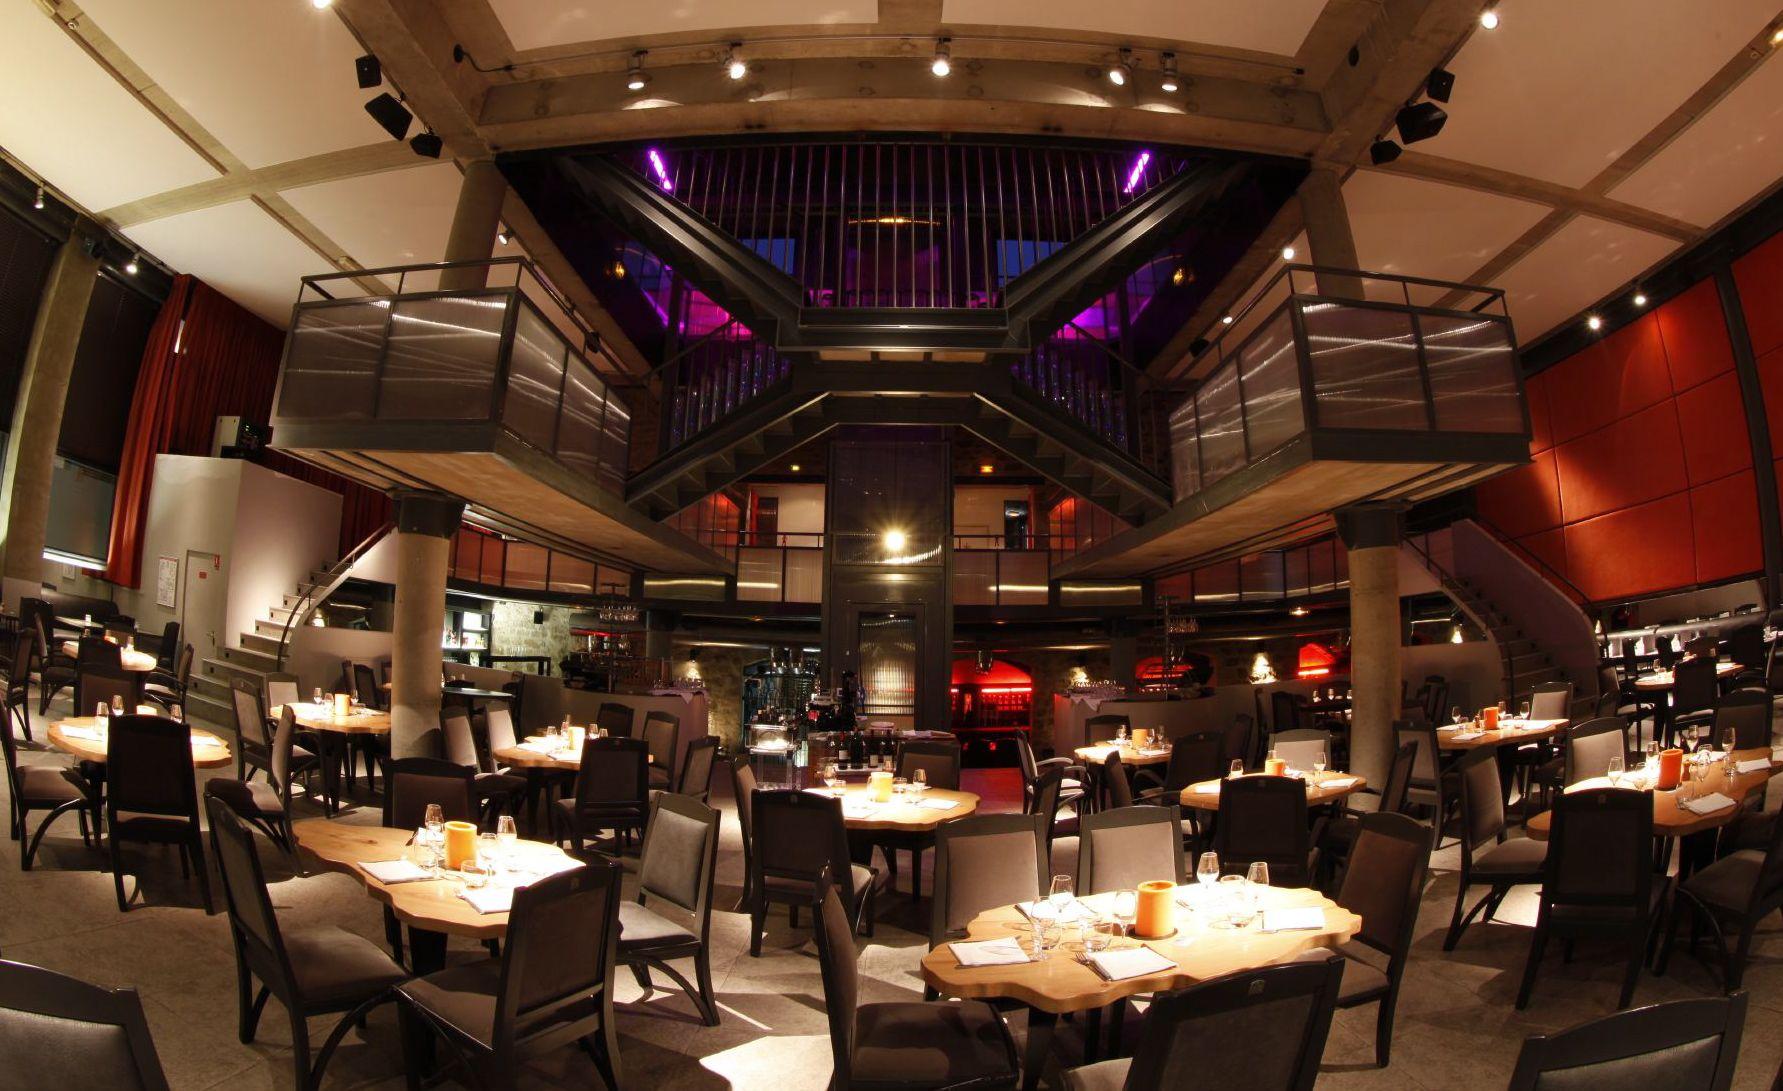 Fonds-restaurant-2